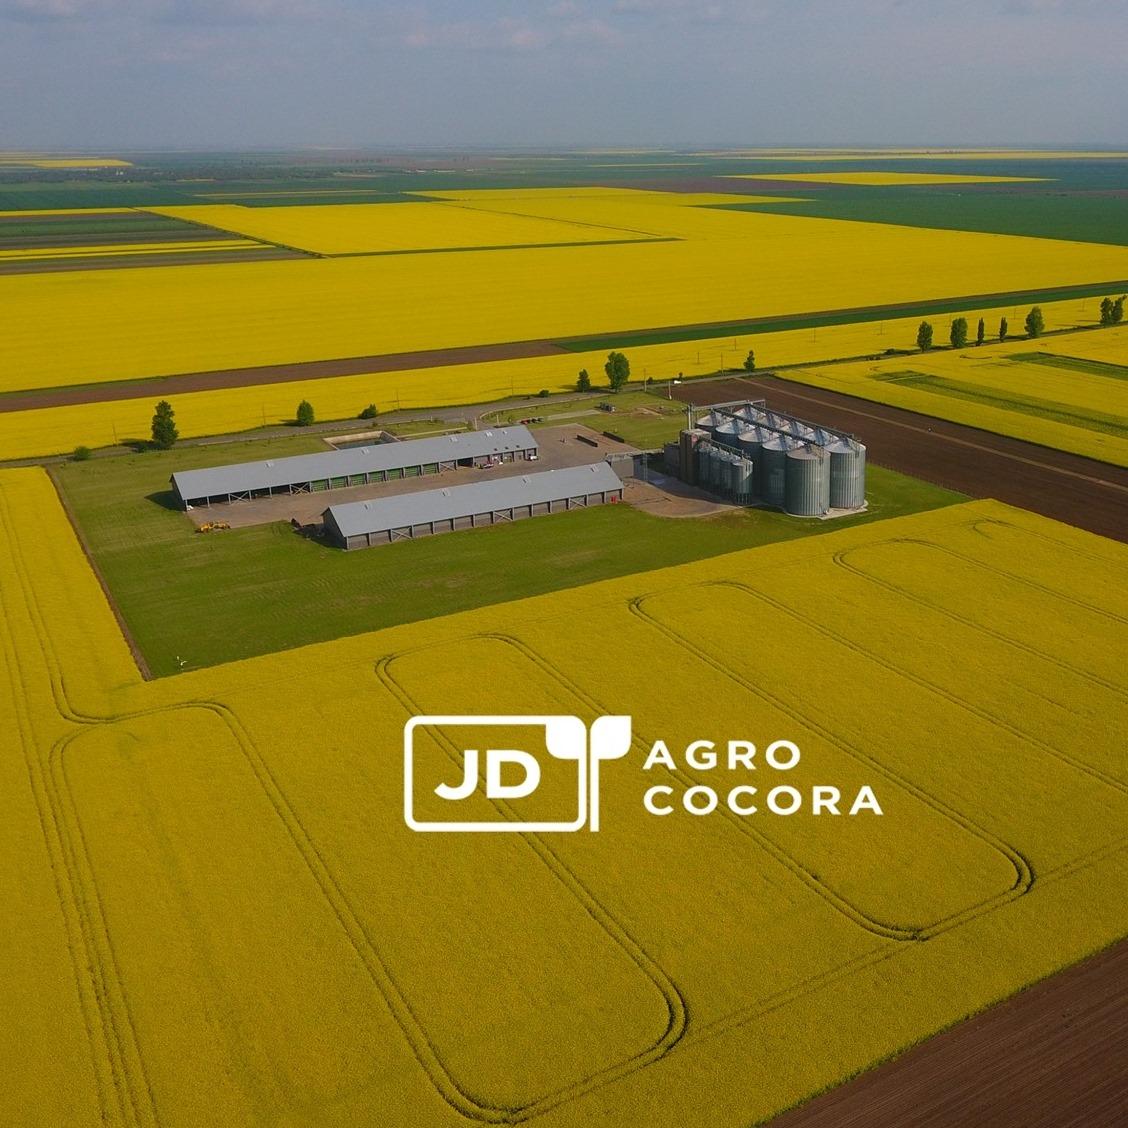 Fuziune intre Jantzen Development și JD Agro Cocora